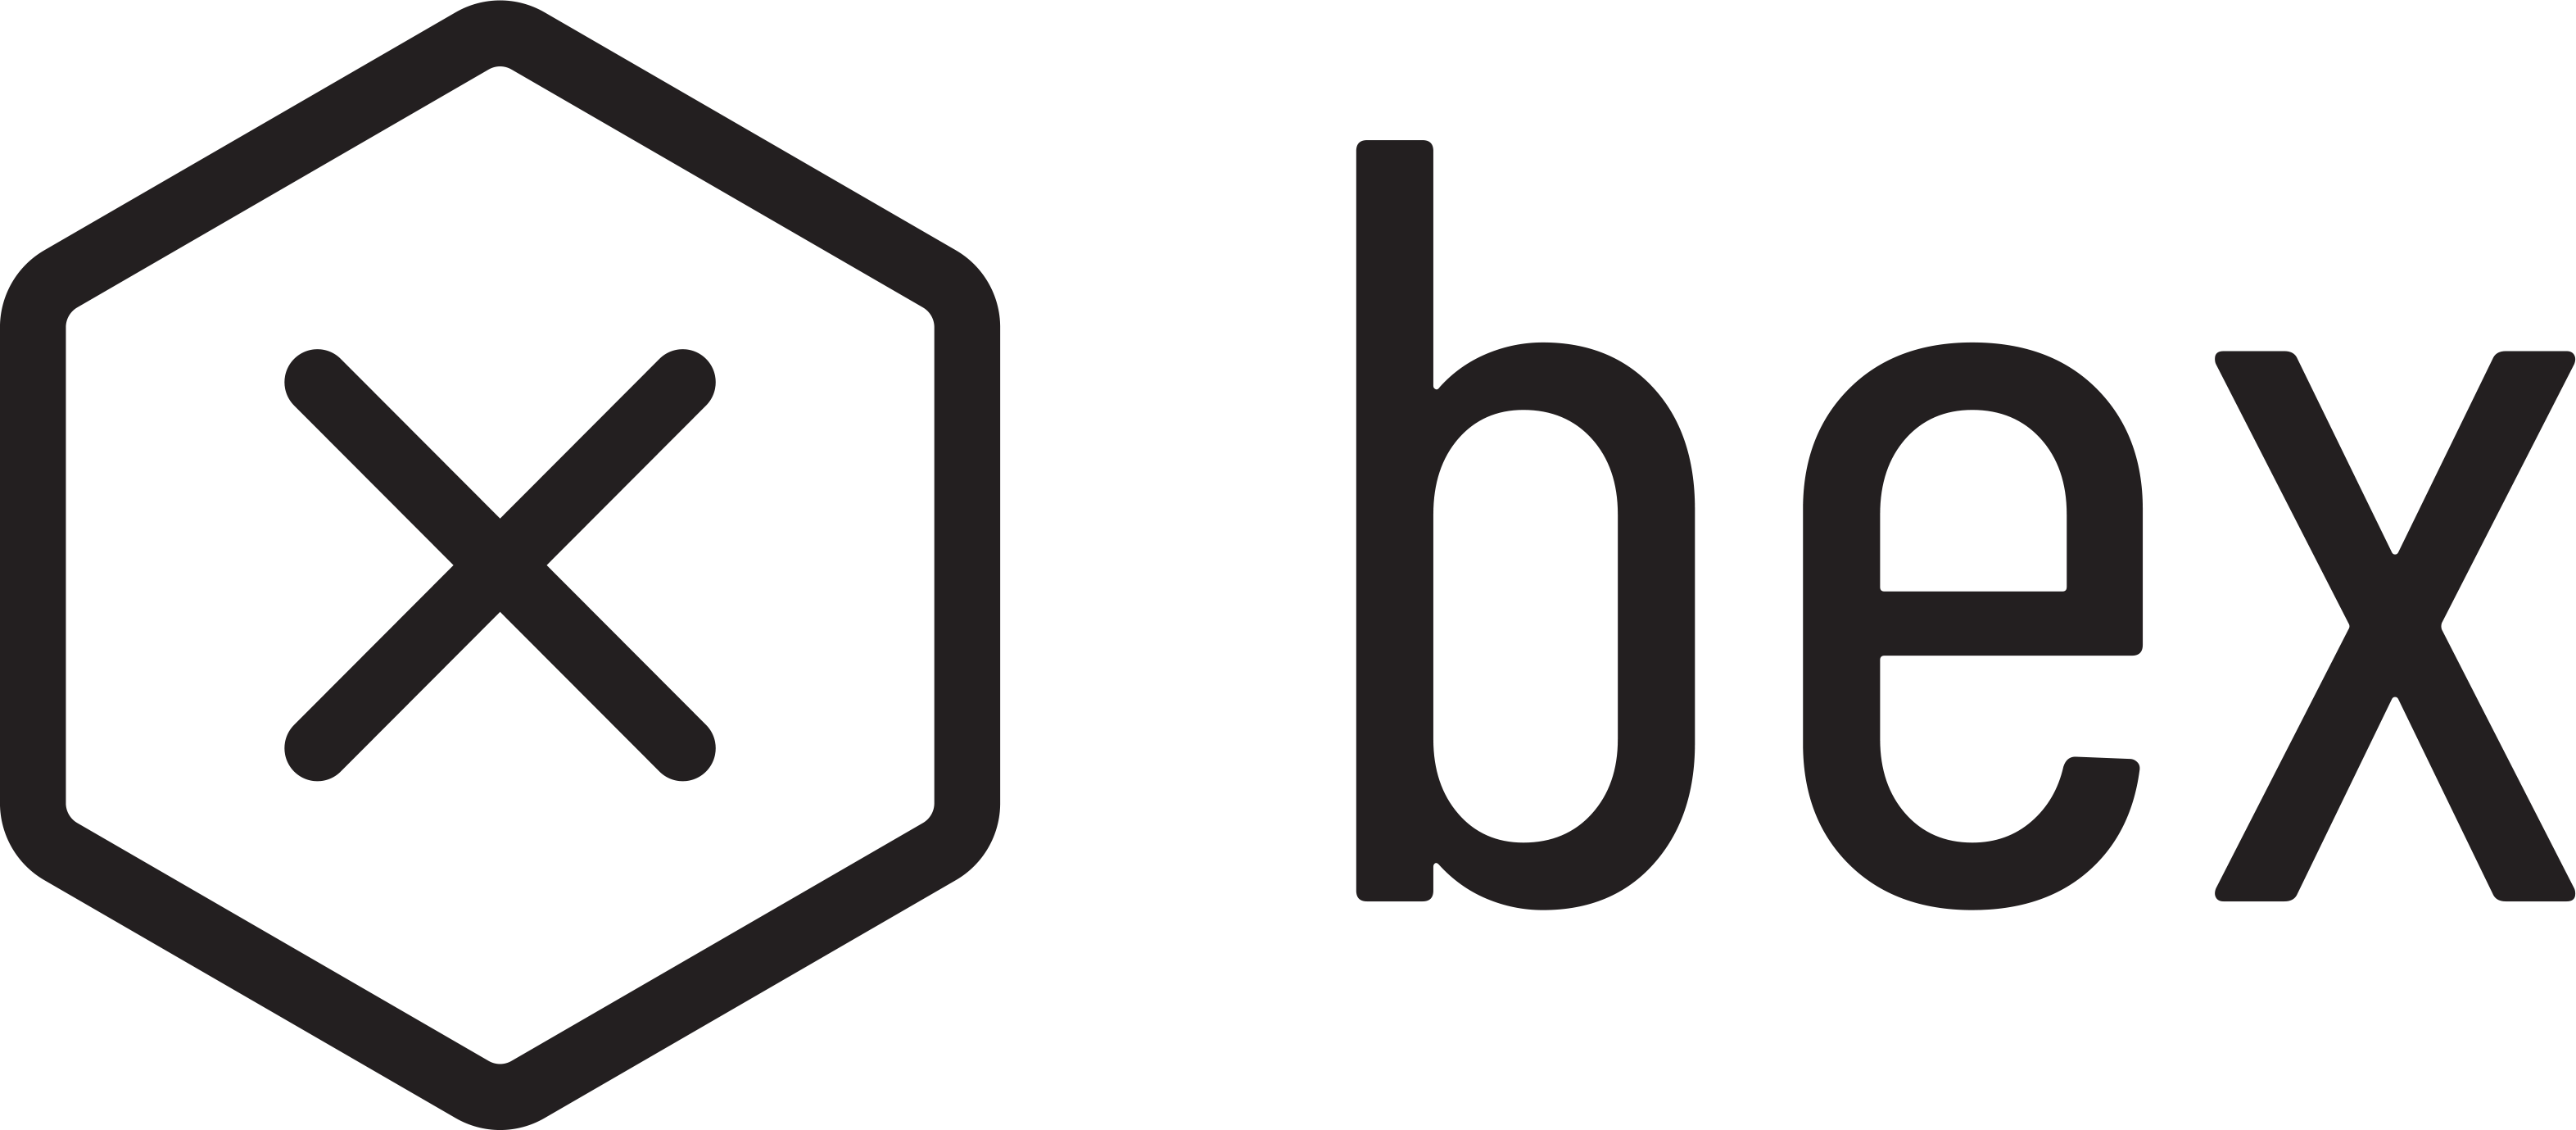 bex-logo